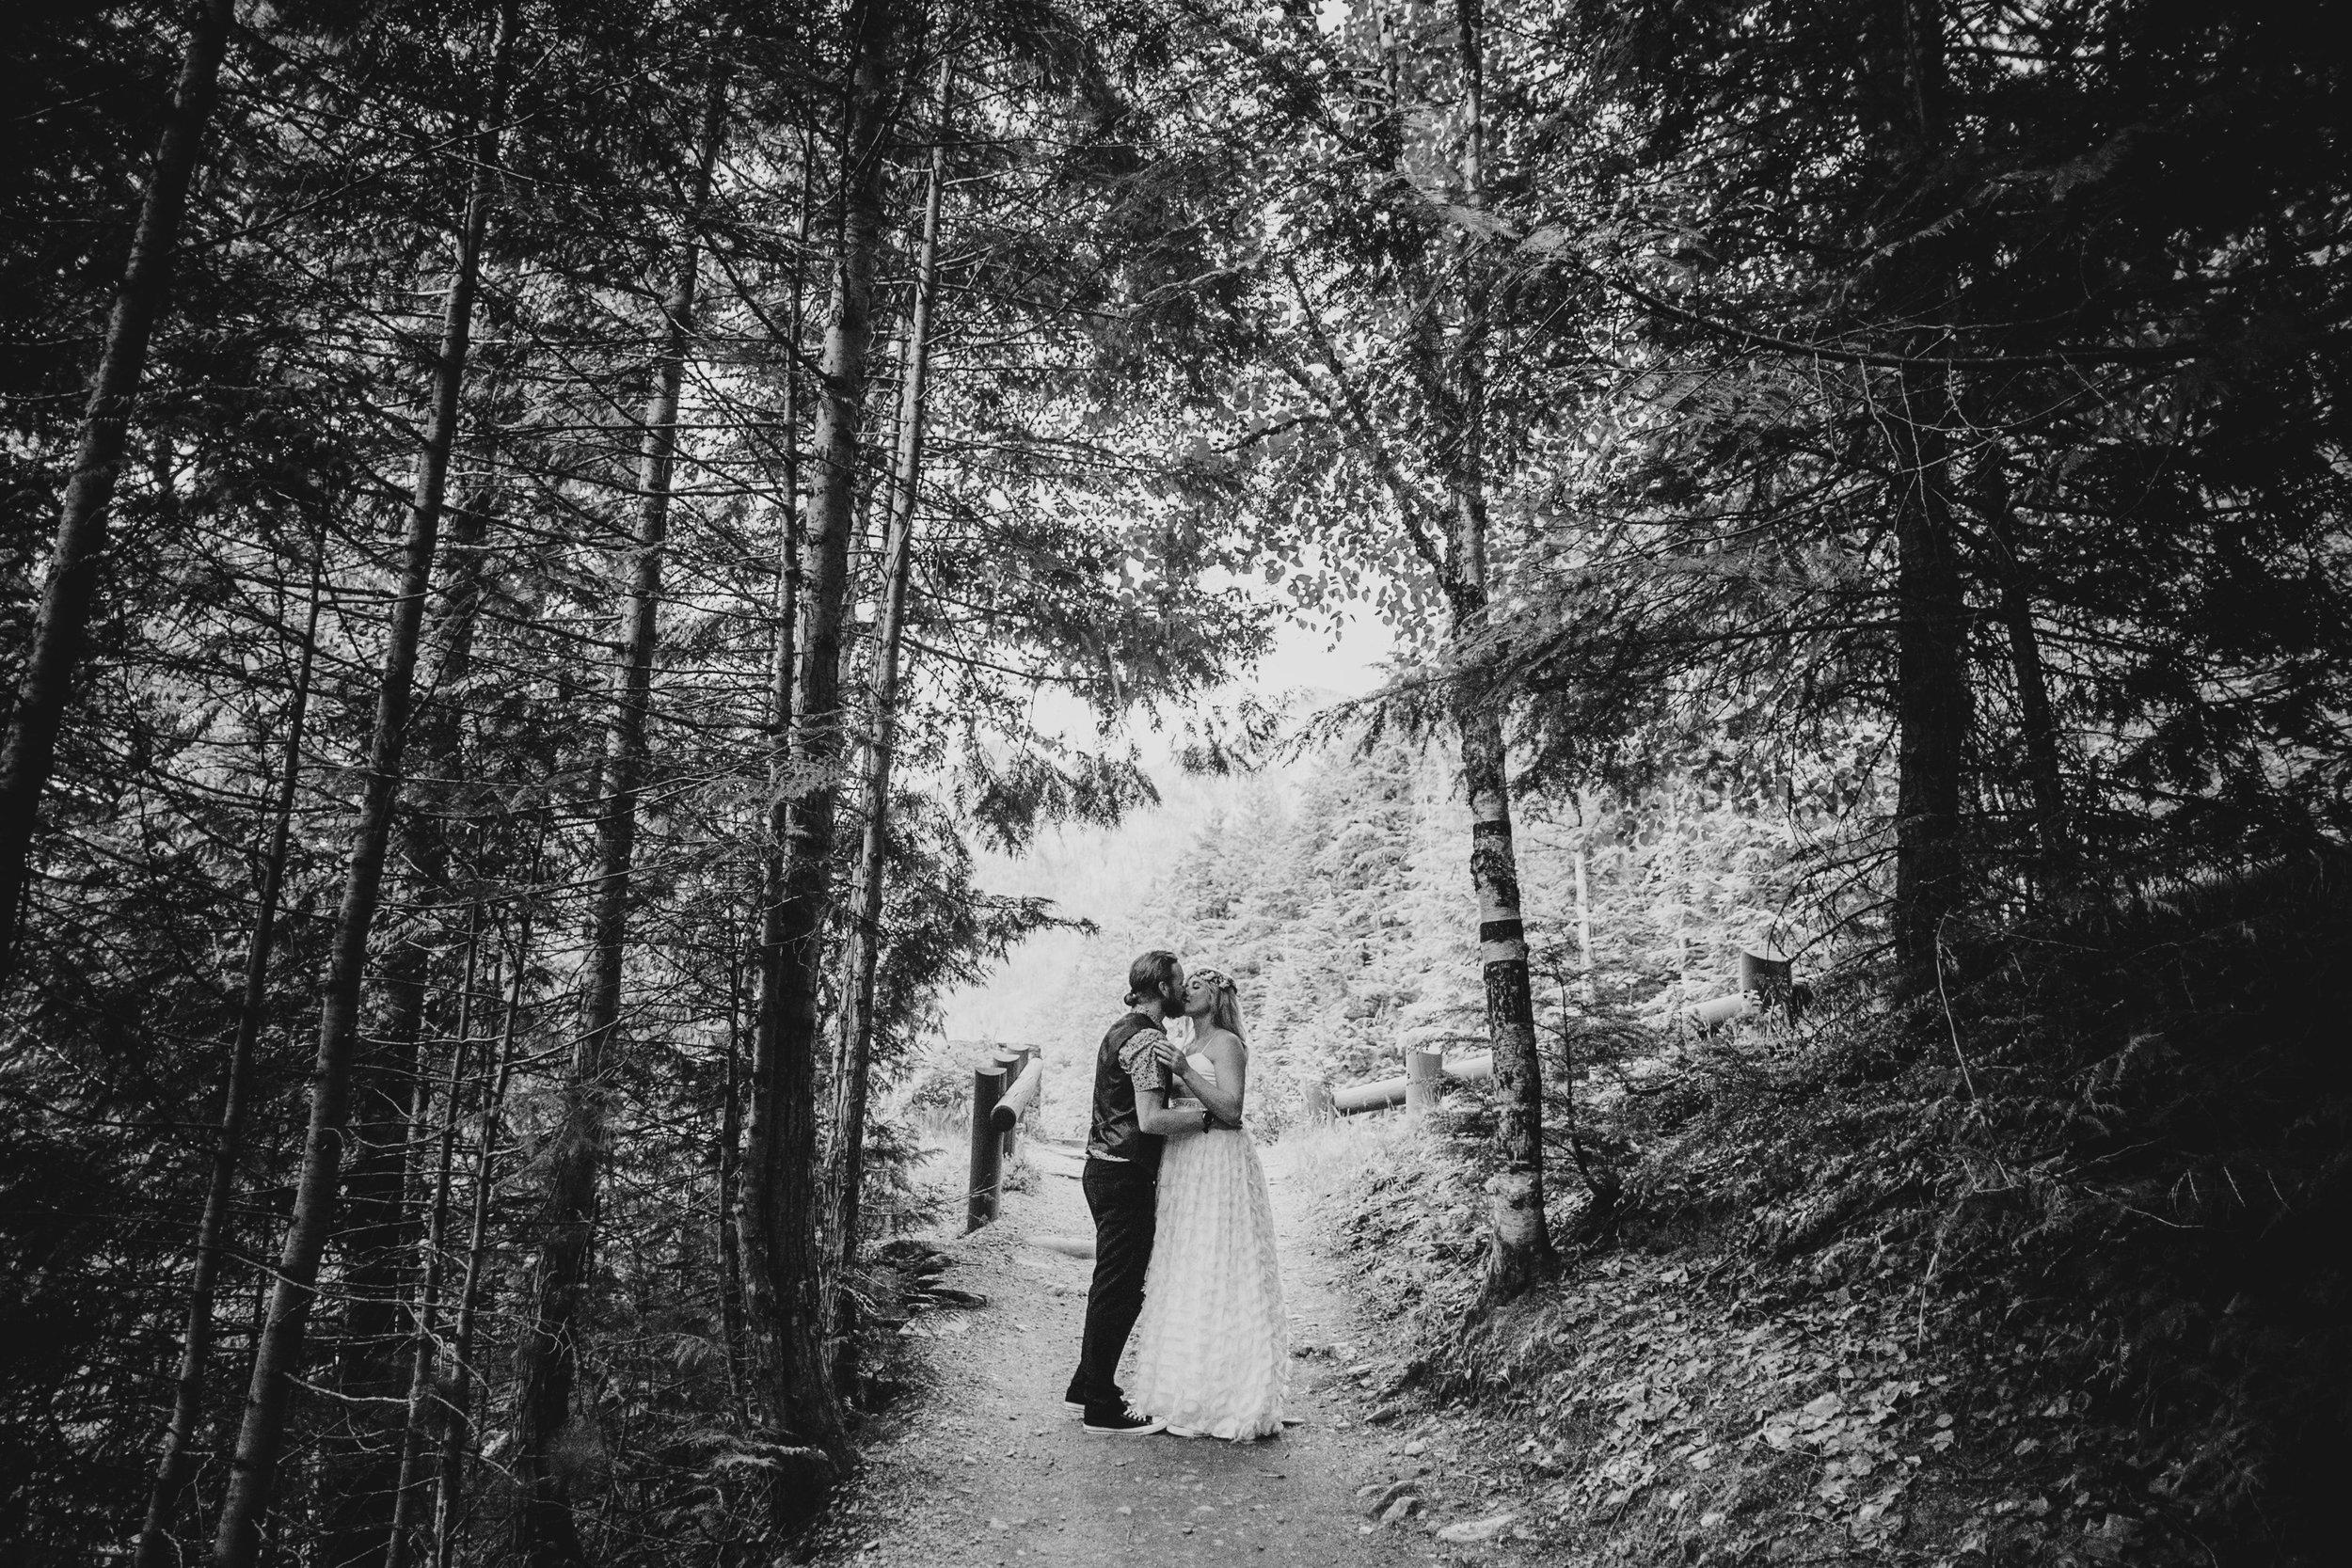 lindseyjane_elopement103.jpg